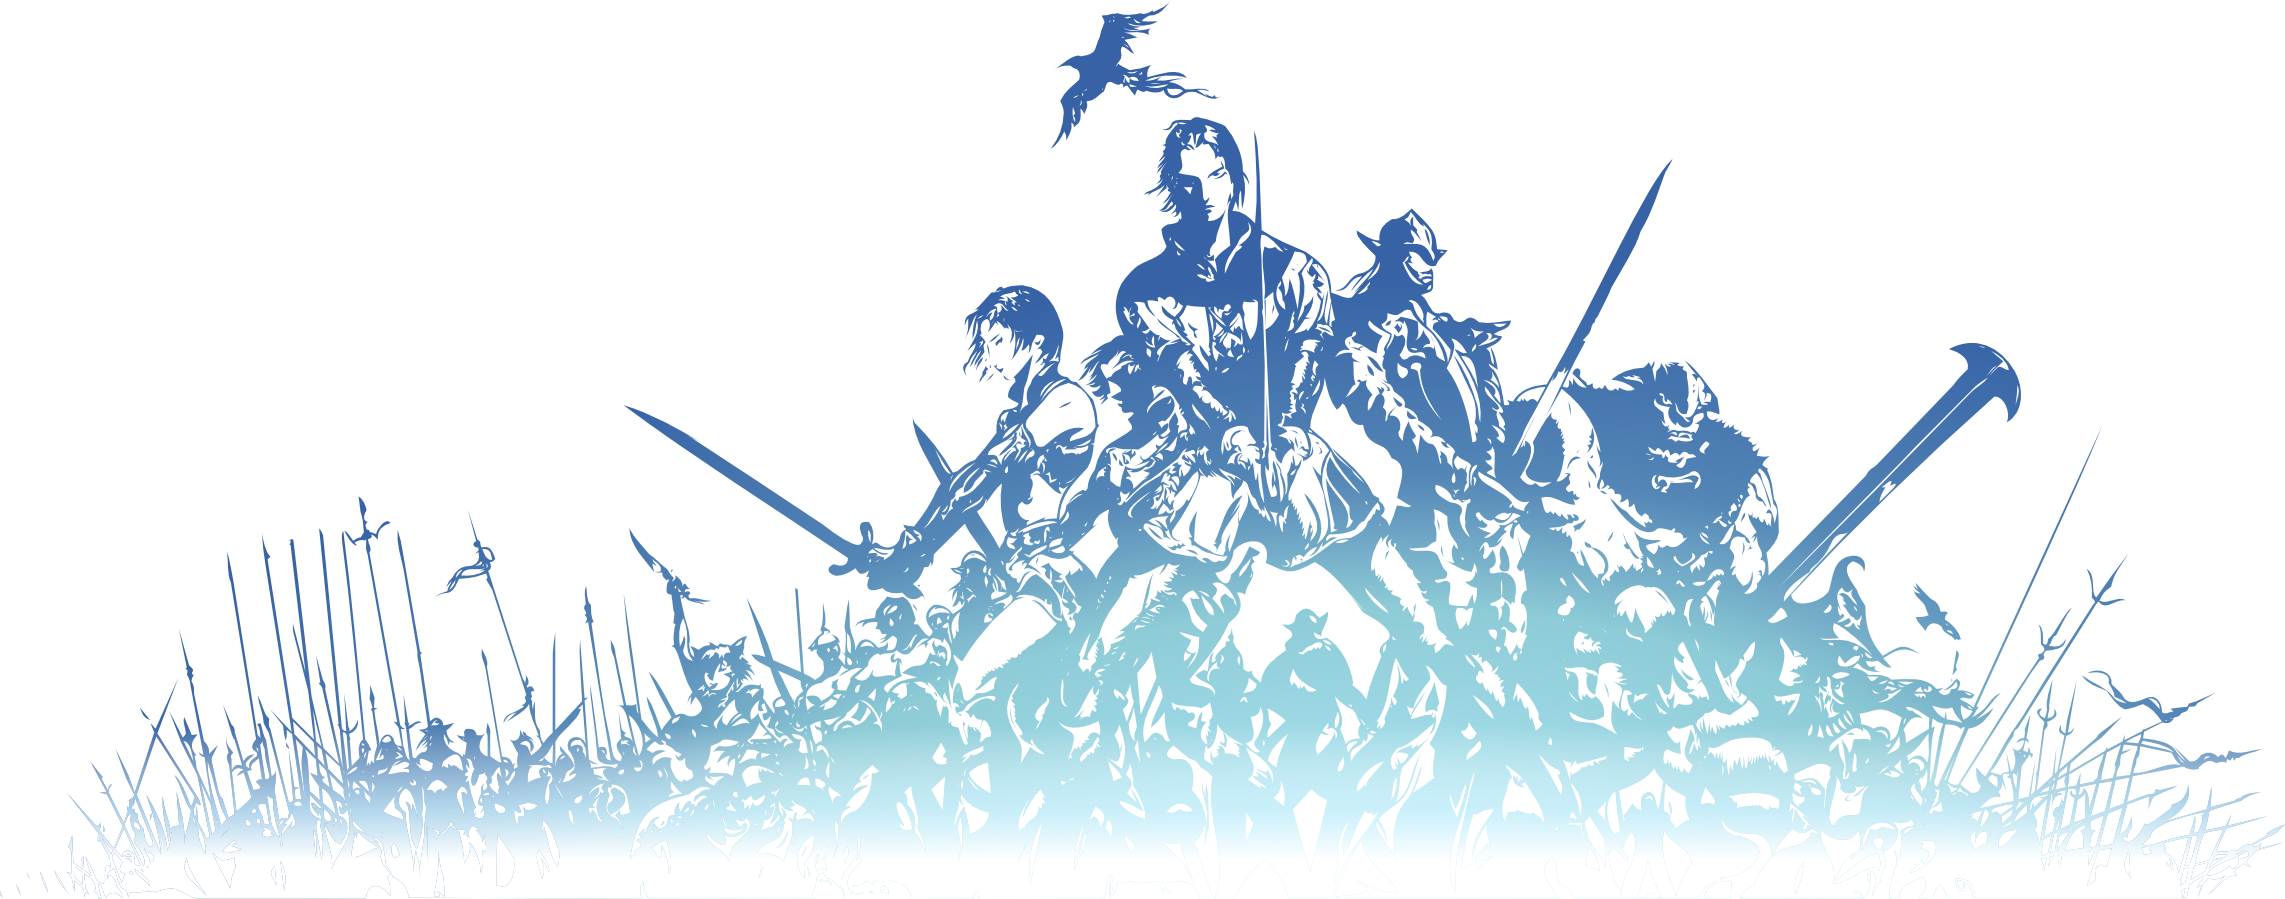 Final fantasy xii logo png - photo#15